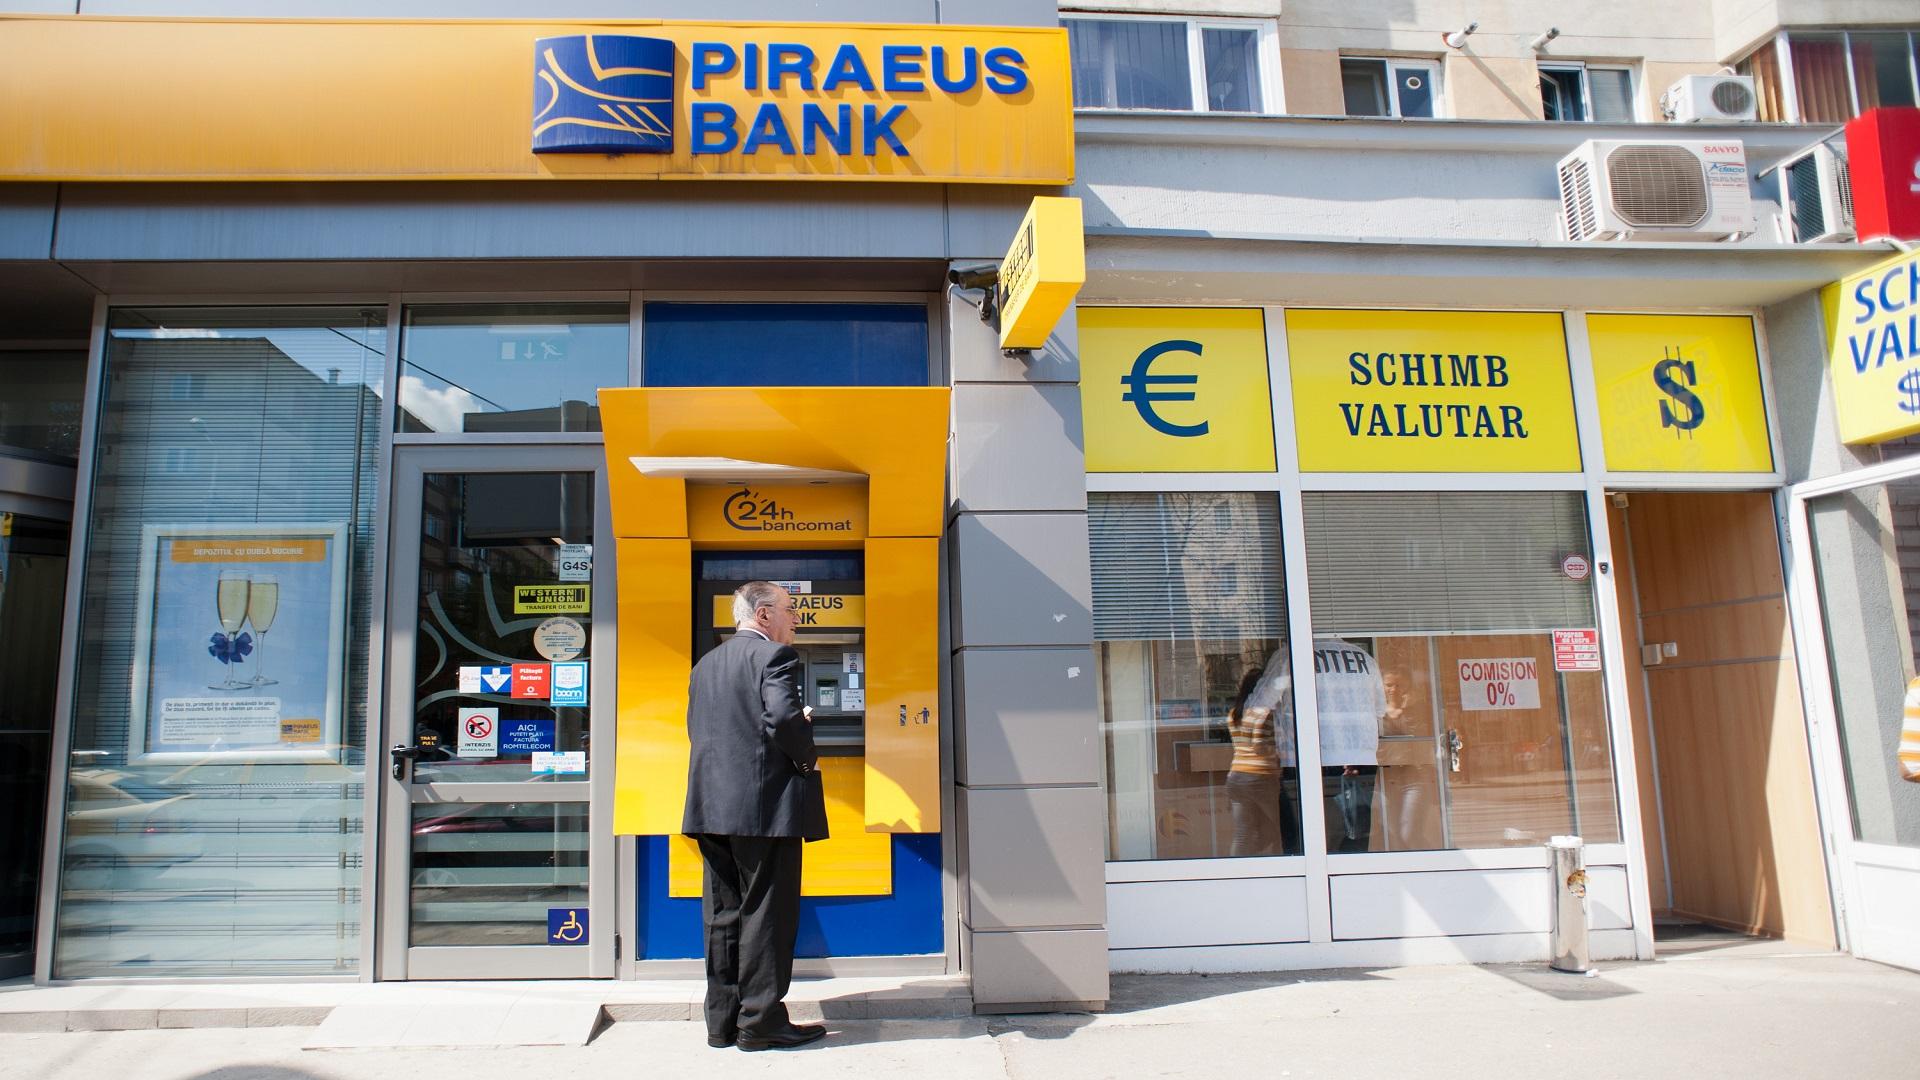 بنك بيريوس اليوناني يتخارج رسميا من مصر